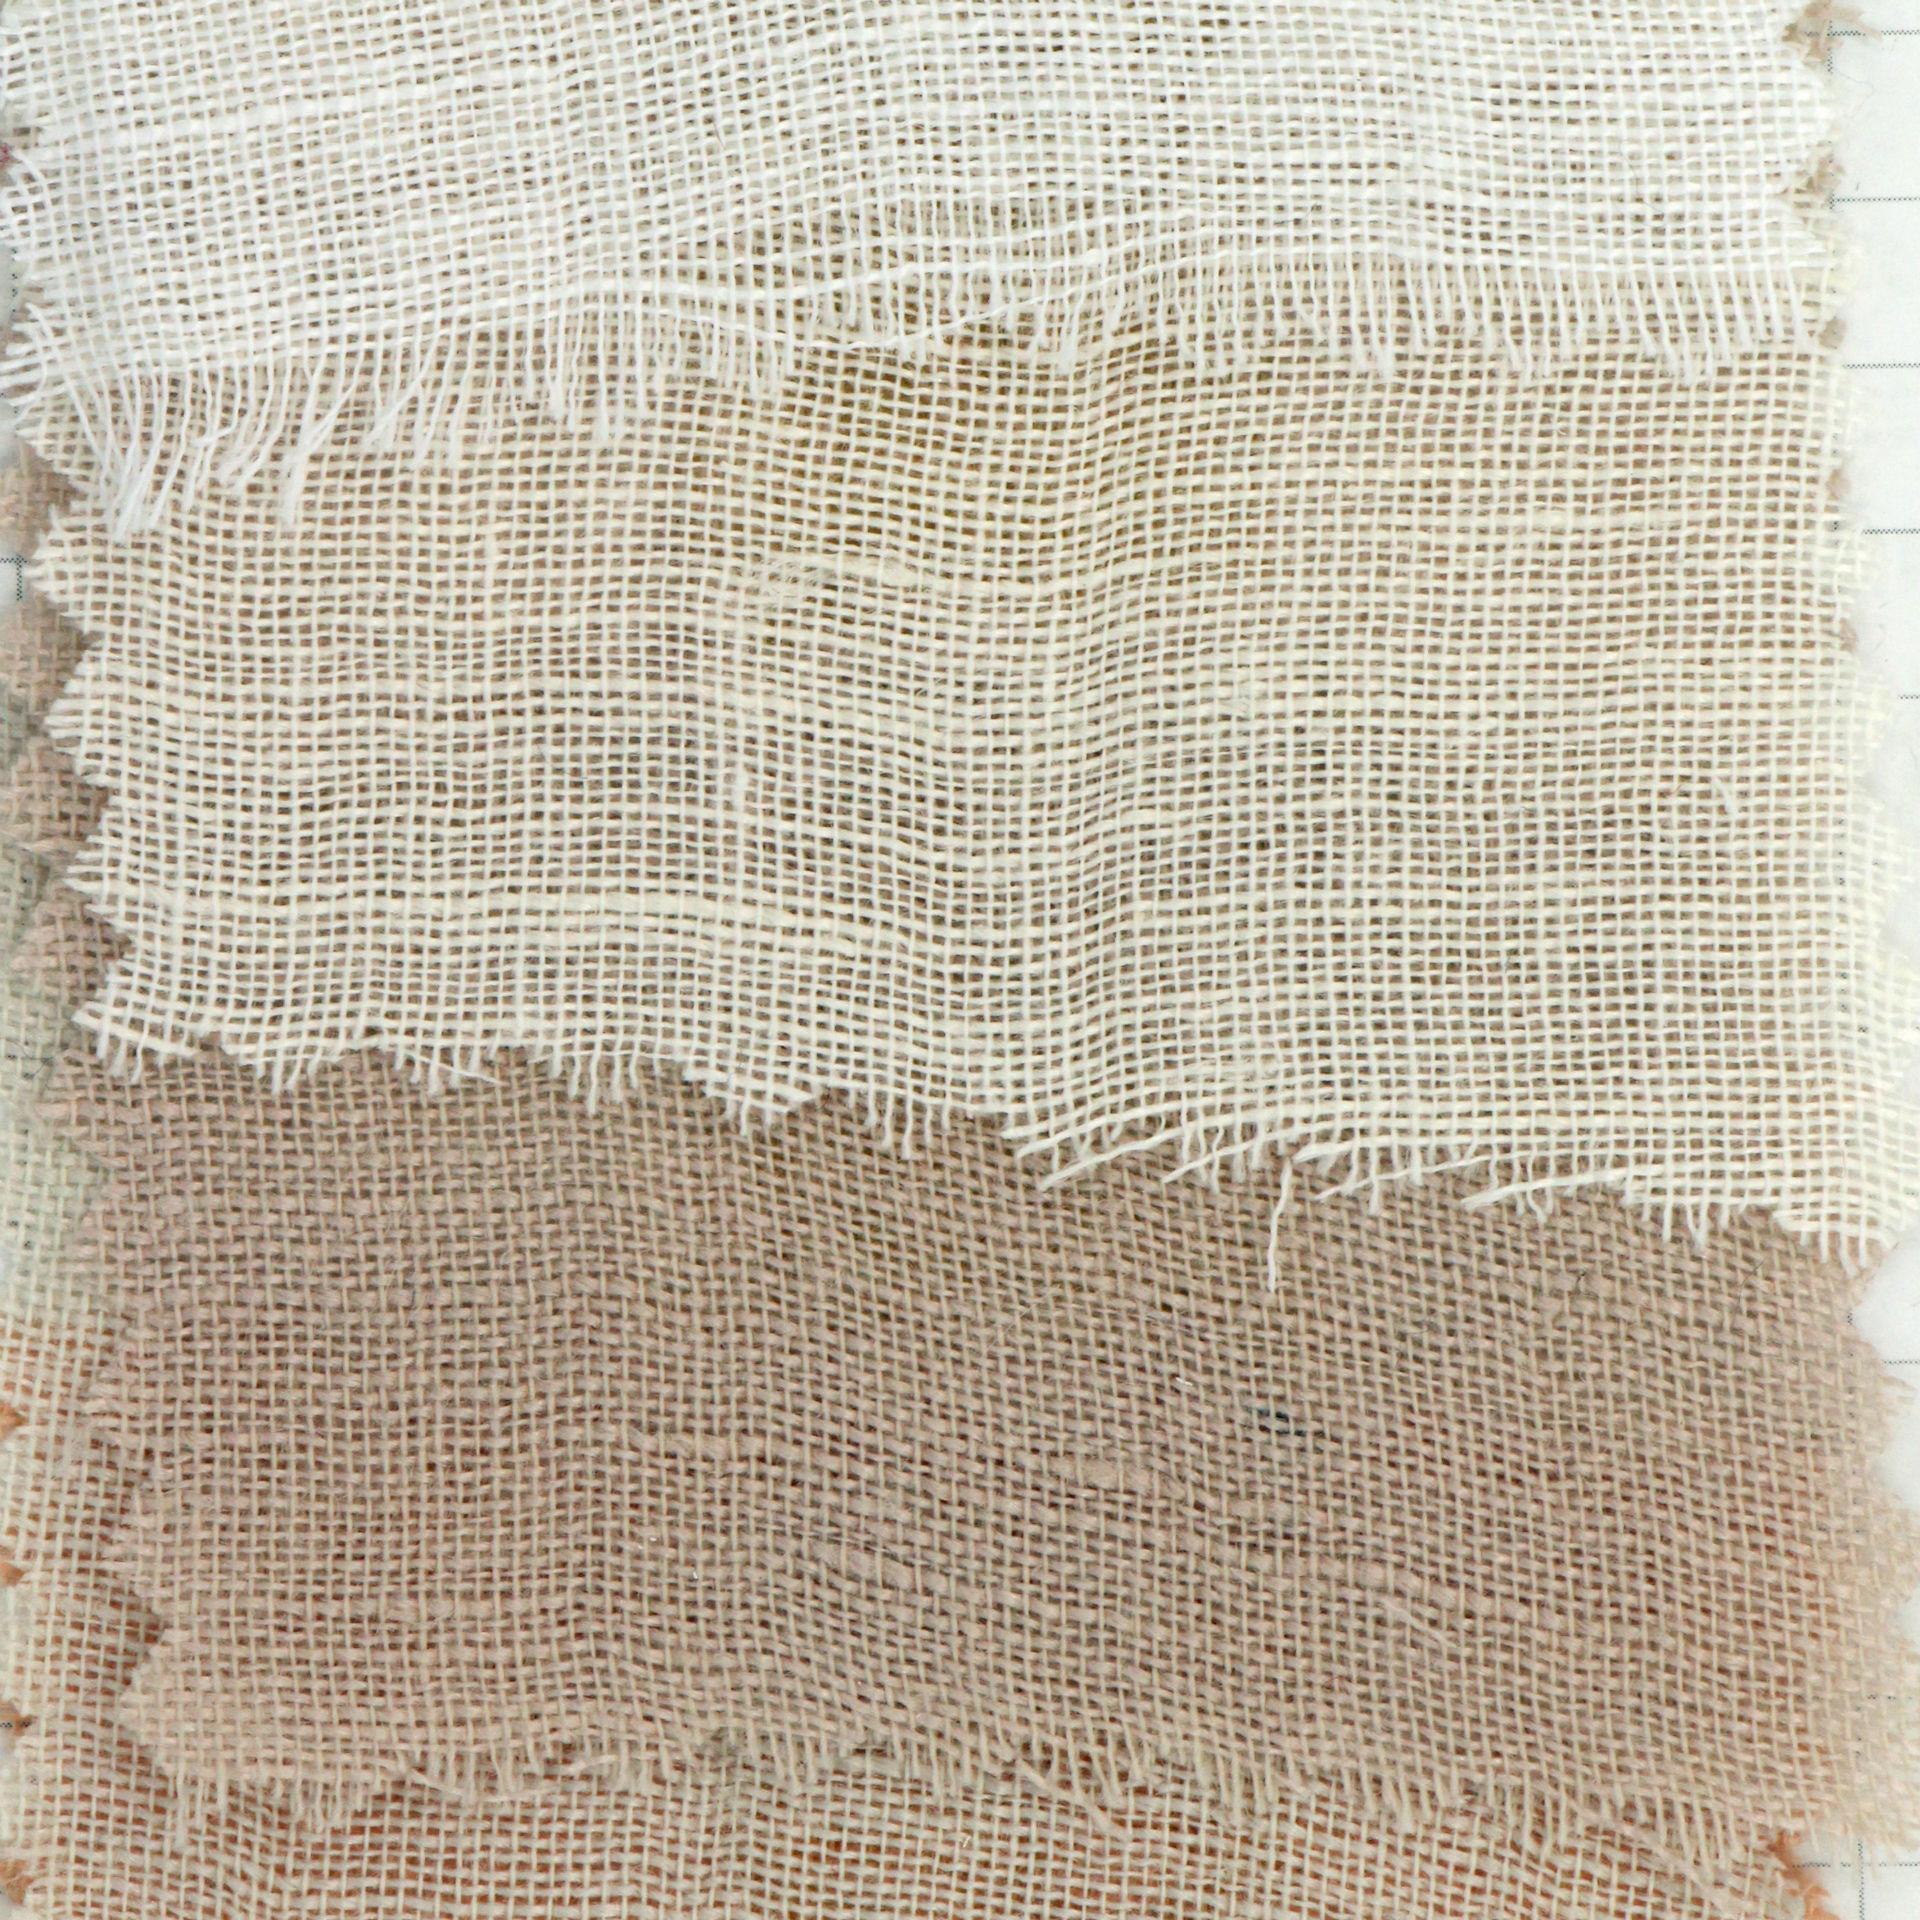 Creased ramie fabric MD32 ramie fabric